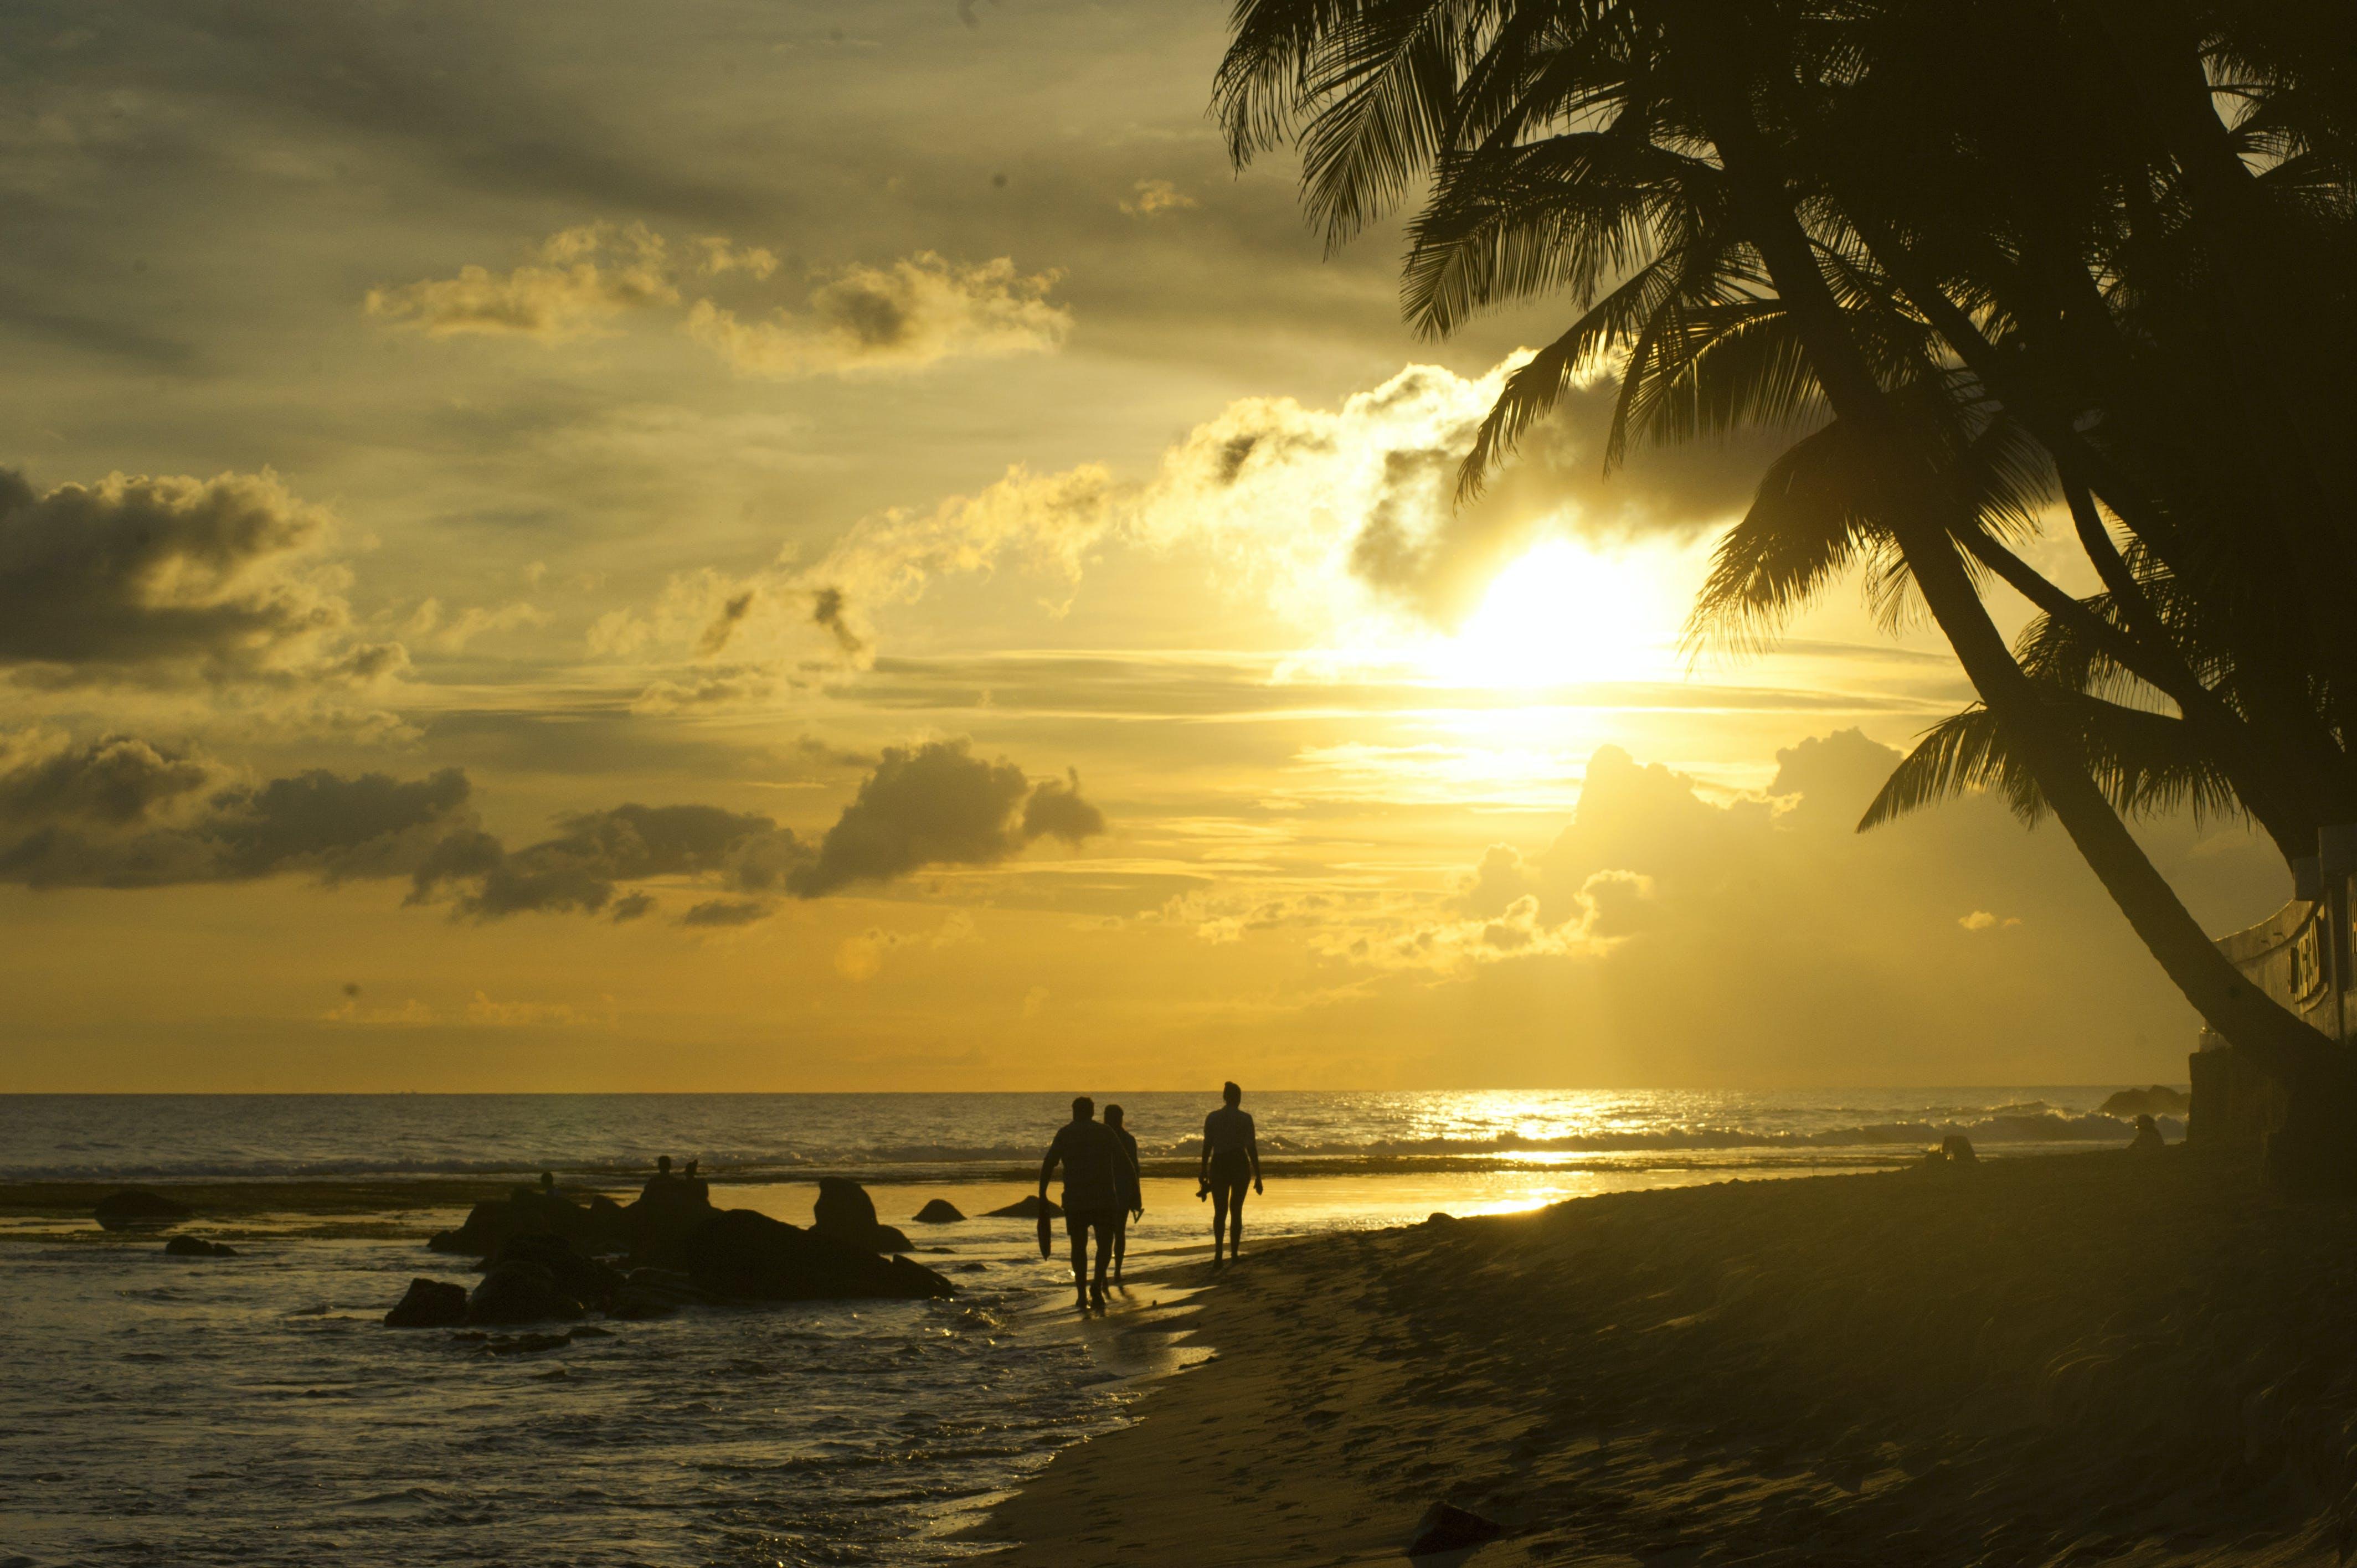 Silhouette of Three Person Walking on Seashore